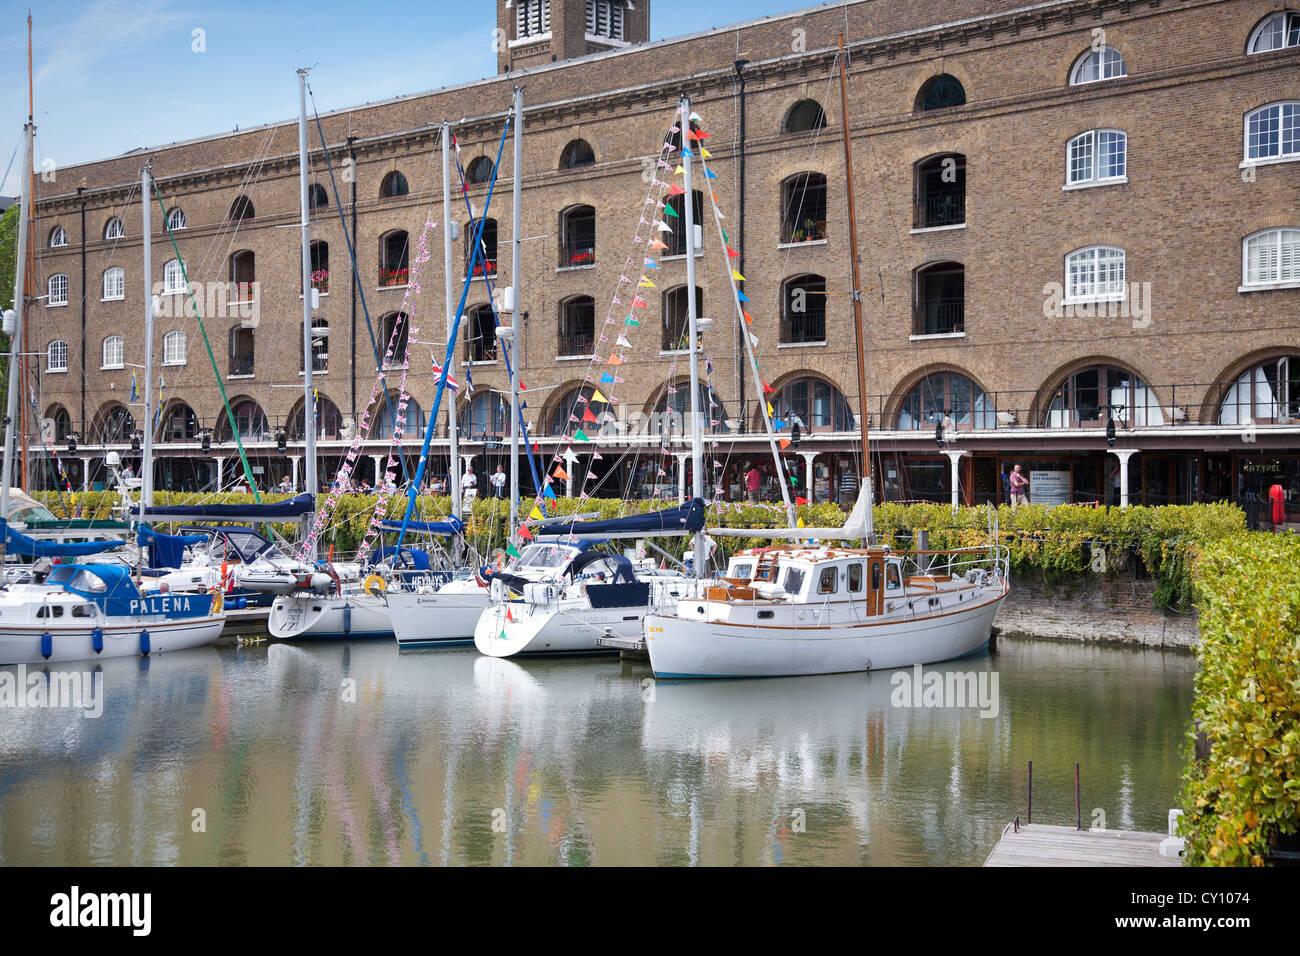 In Inghilterra. Londra. St Katharine Docks e casa d'Avorio. Immagini Stock